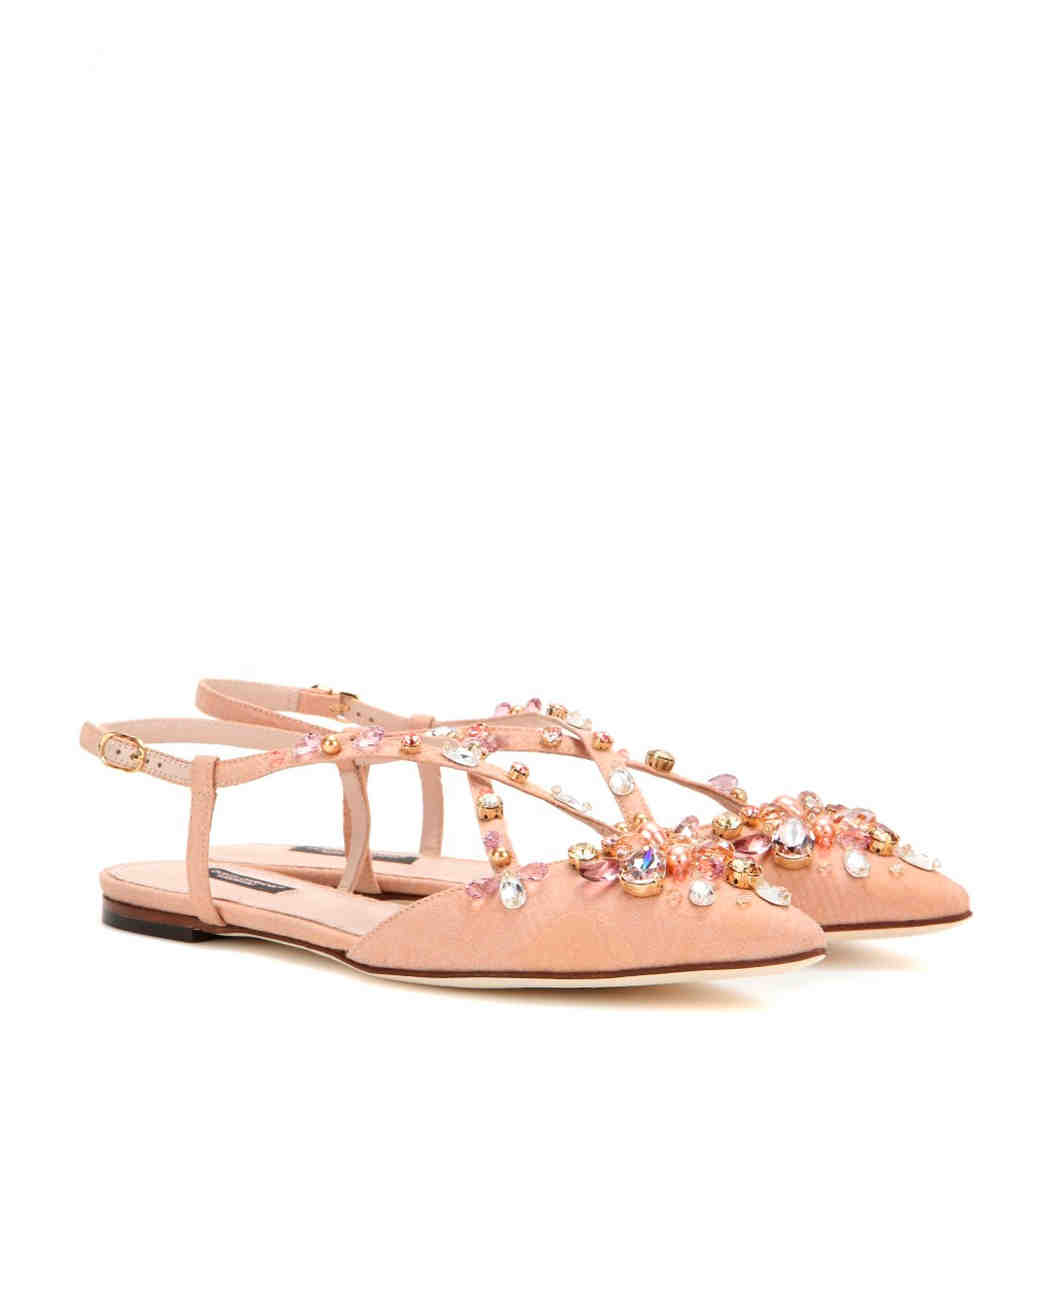 closed-toe-wedding-shoes-dolce-gabbana-mytheresa-1215.jpg